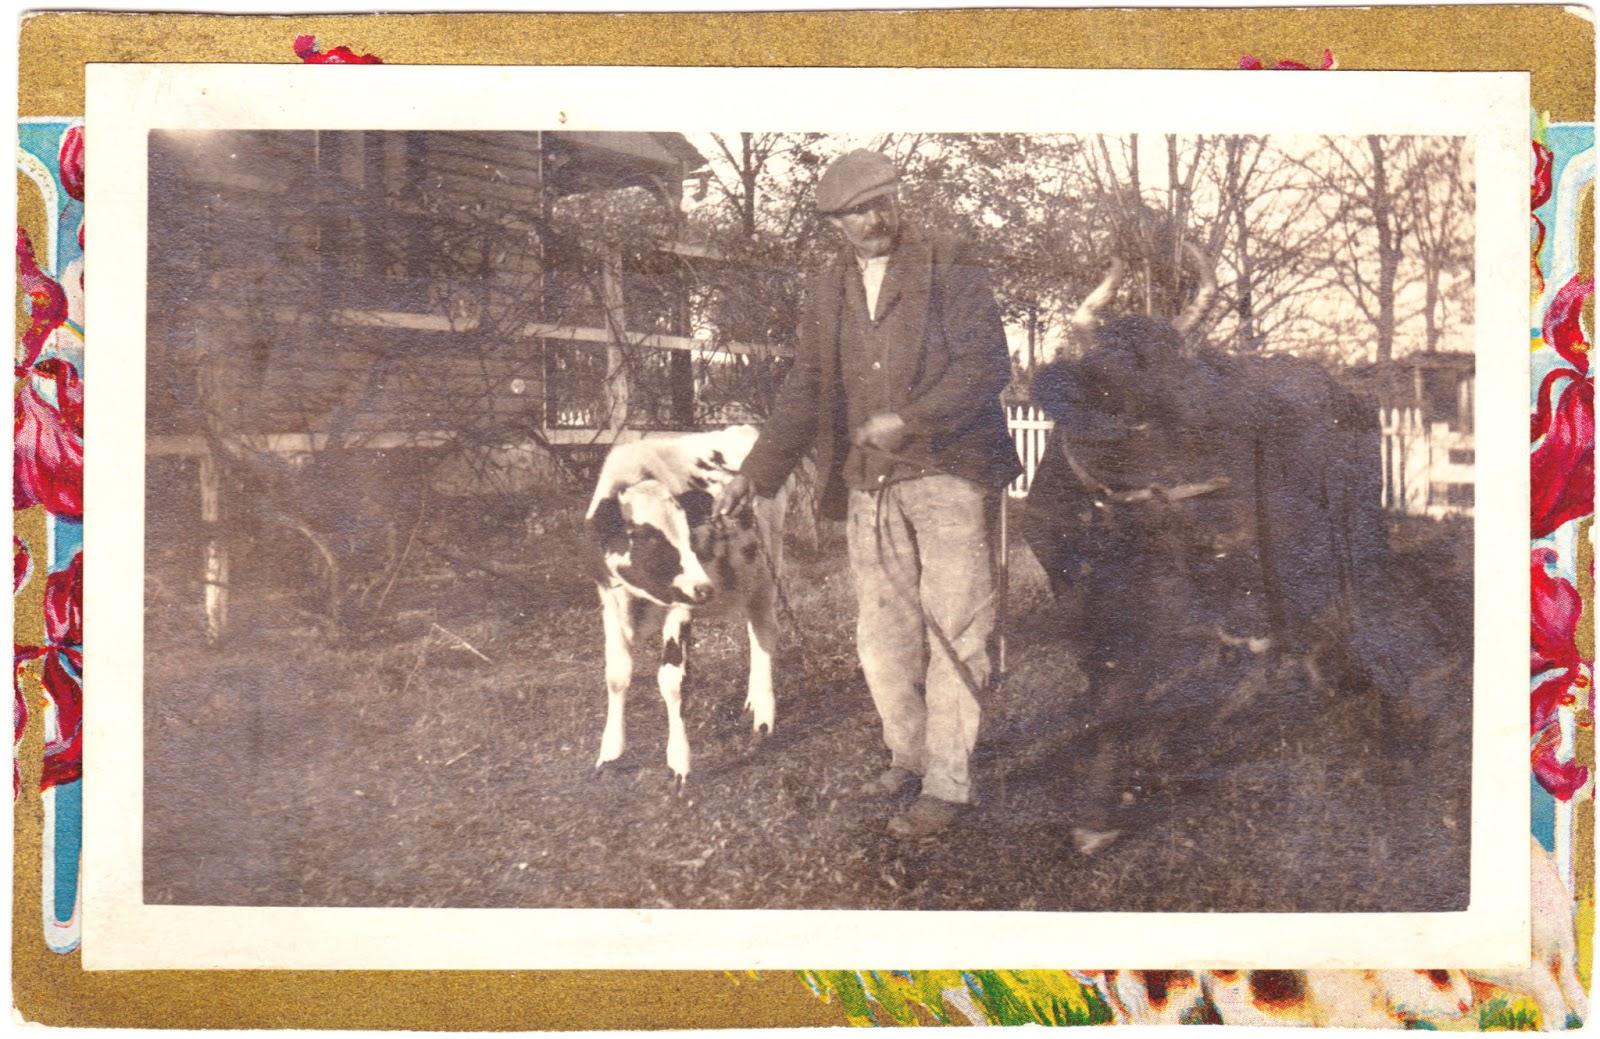 http://2.bp.blogspot.com/-PJ0Ll_vMqgI/UTttoaF3c0I/AAAAAAAAP0Y/ai_RYLMT14I/s1600/Man_And_Cows.jpg